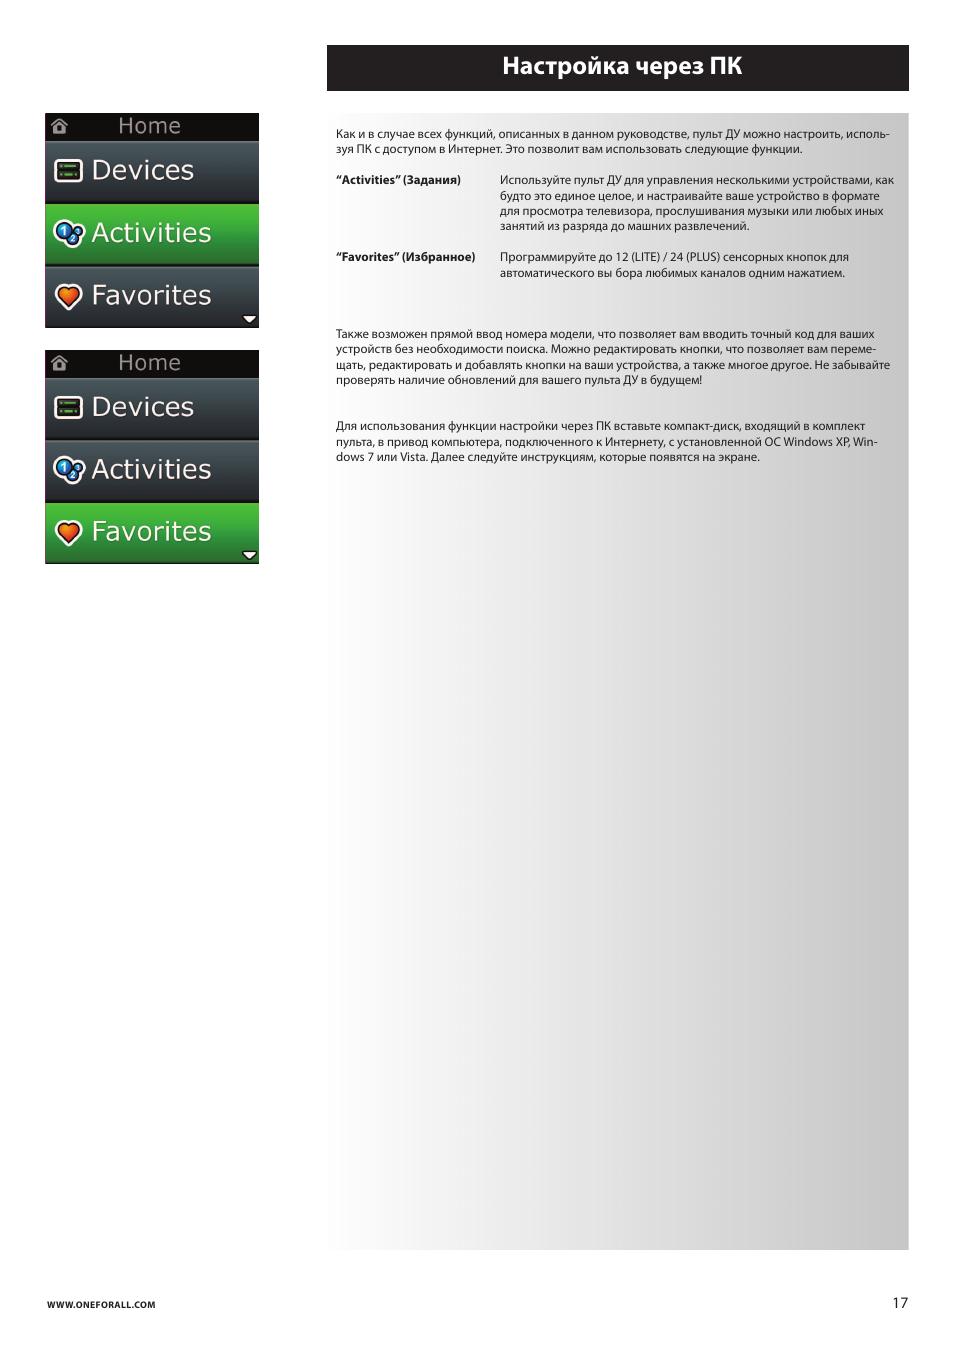 556cfad08e8a Настройка через пк   One for All URC 8620 Xsight Plus User Manual   Page  273   290